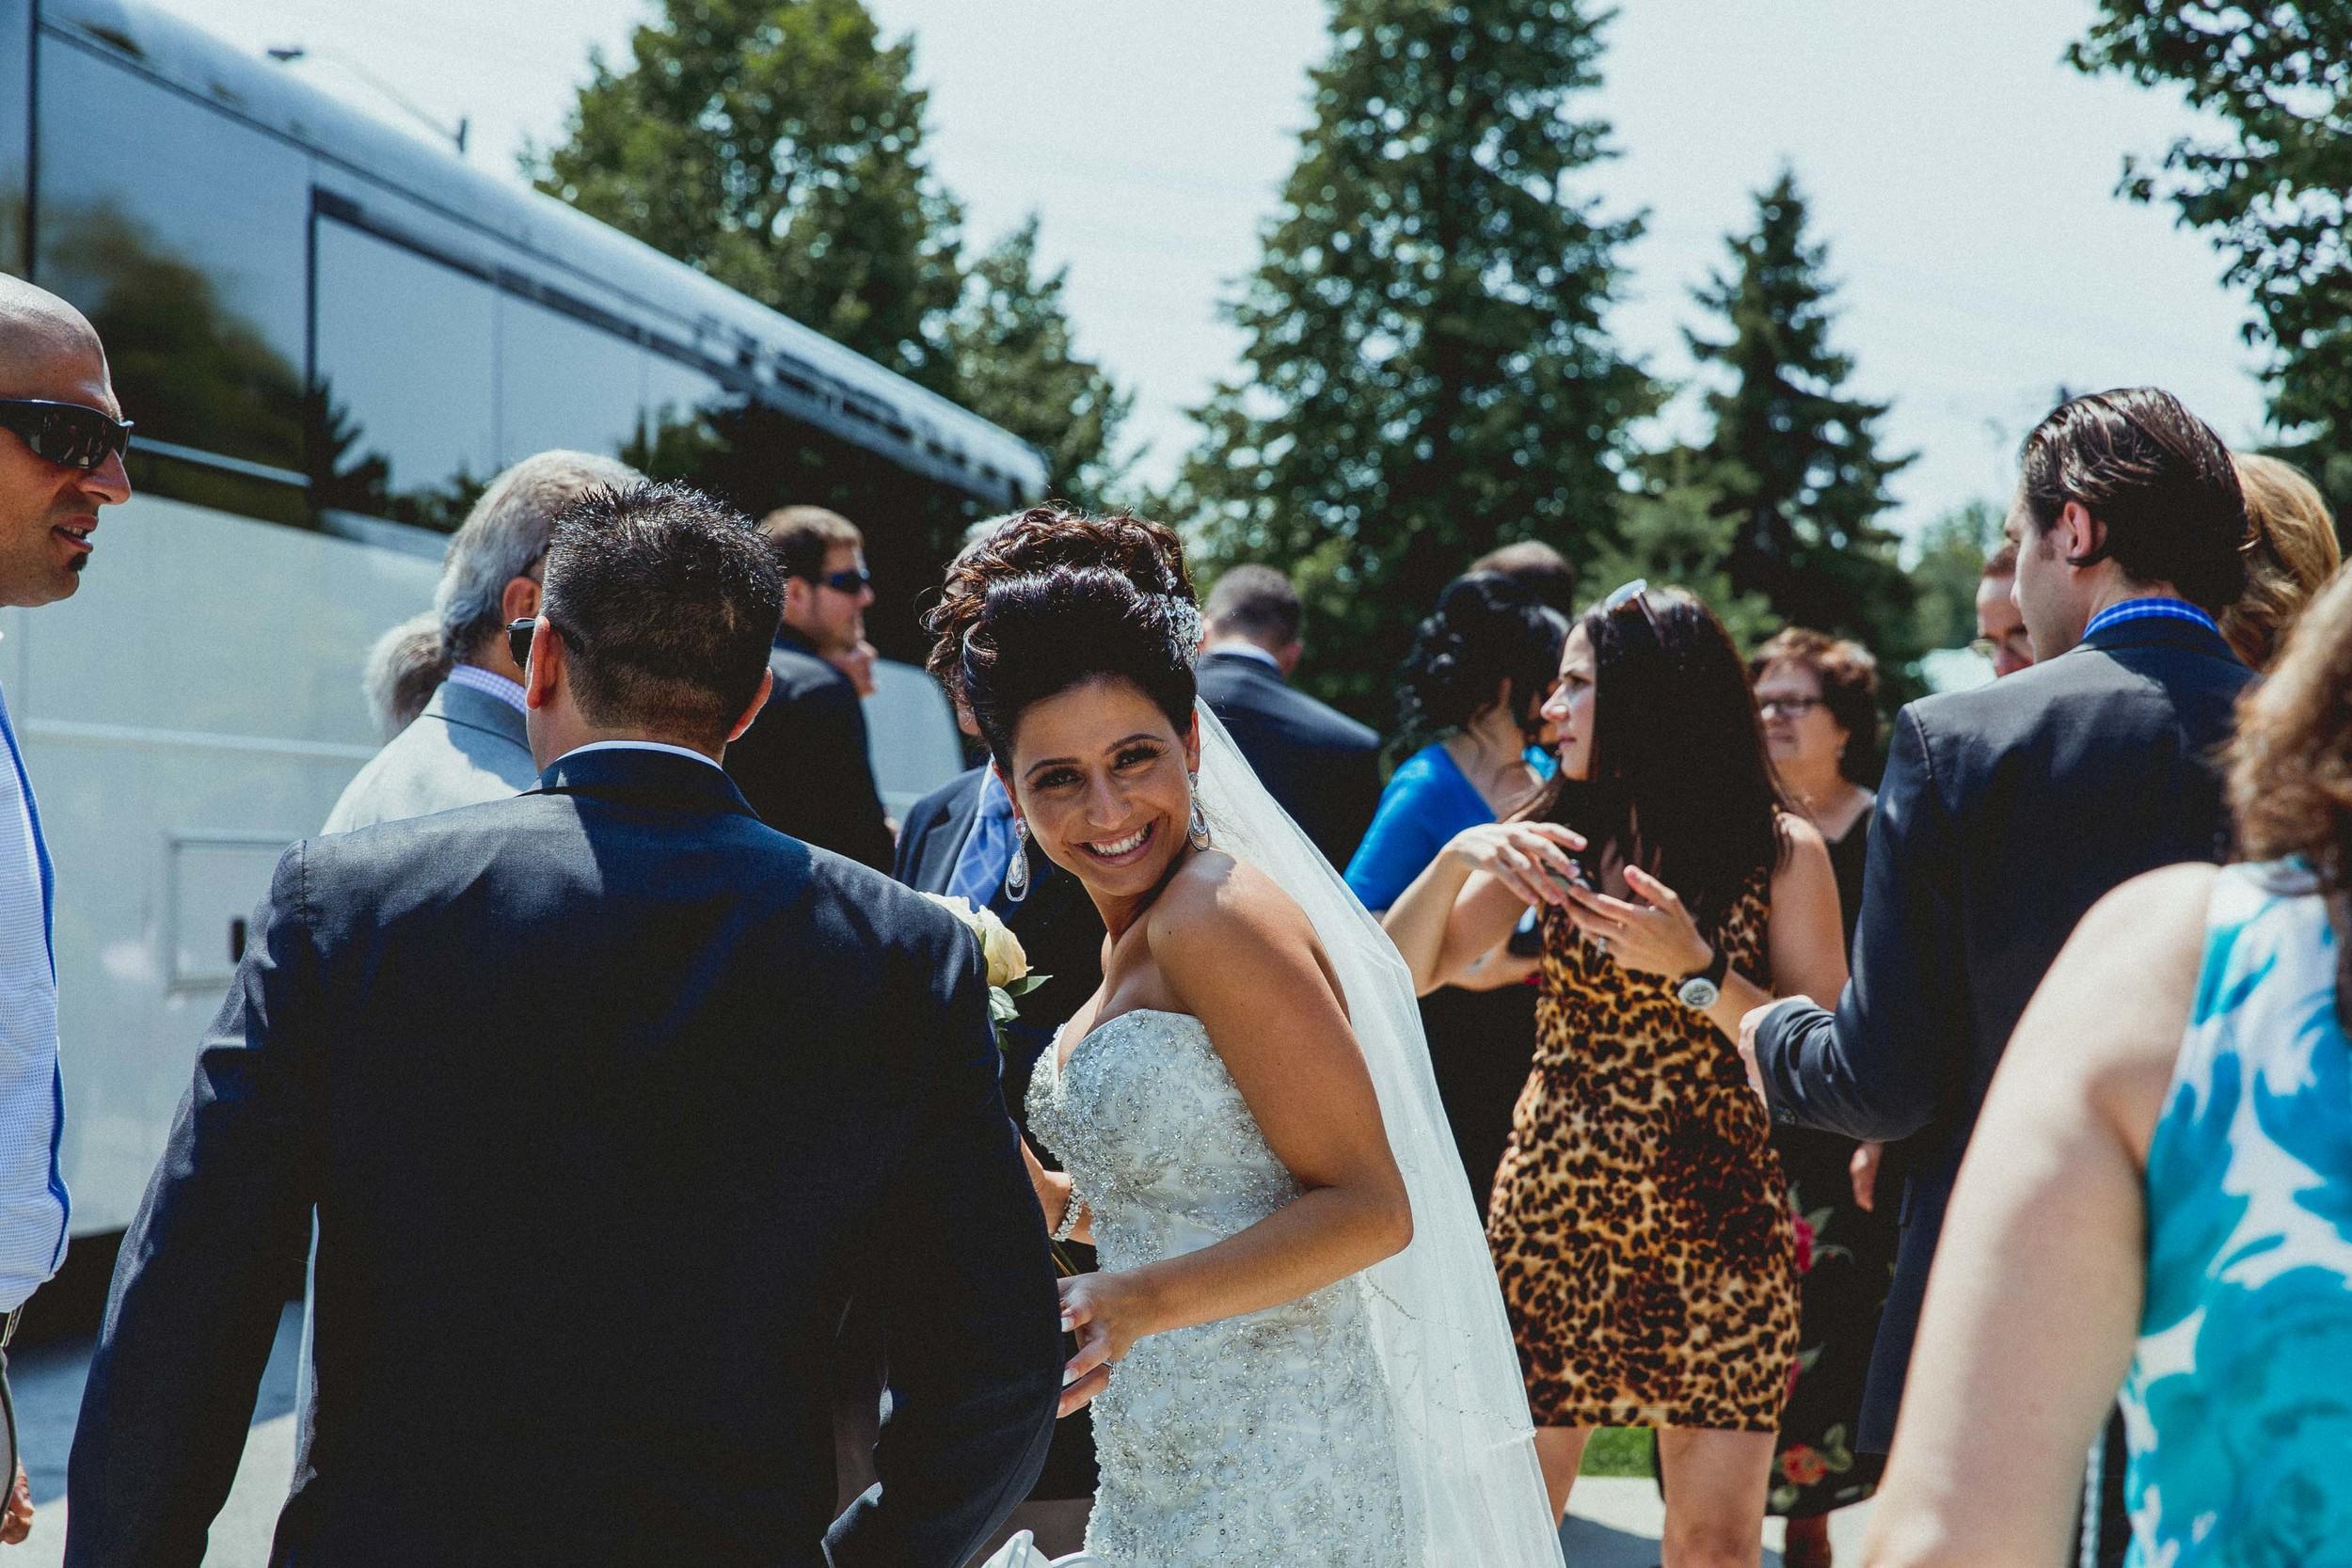 Toronto Wedding Photography | Caterina & Elvis, Pickering catholic wedding (39 of 39).jpg